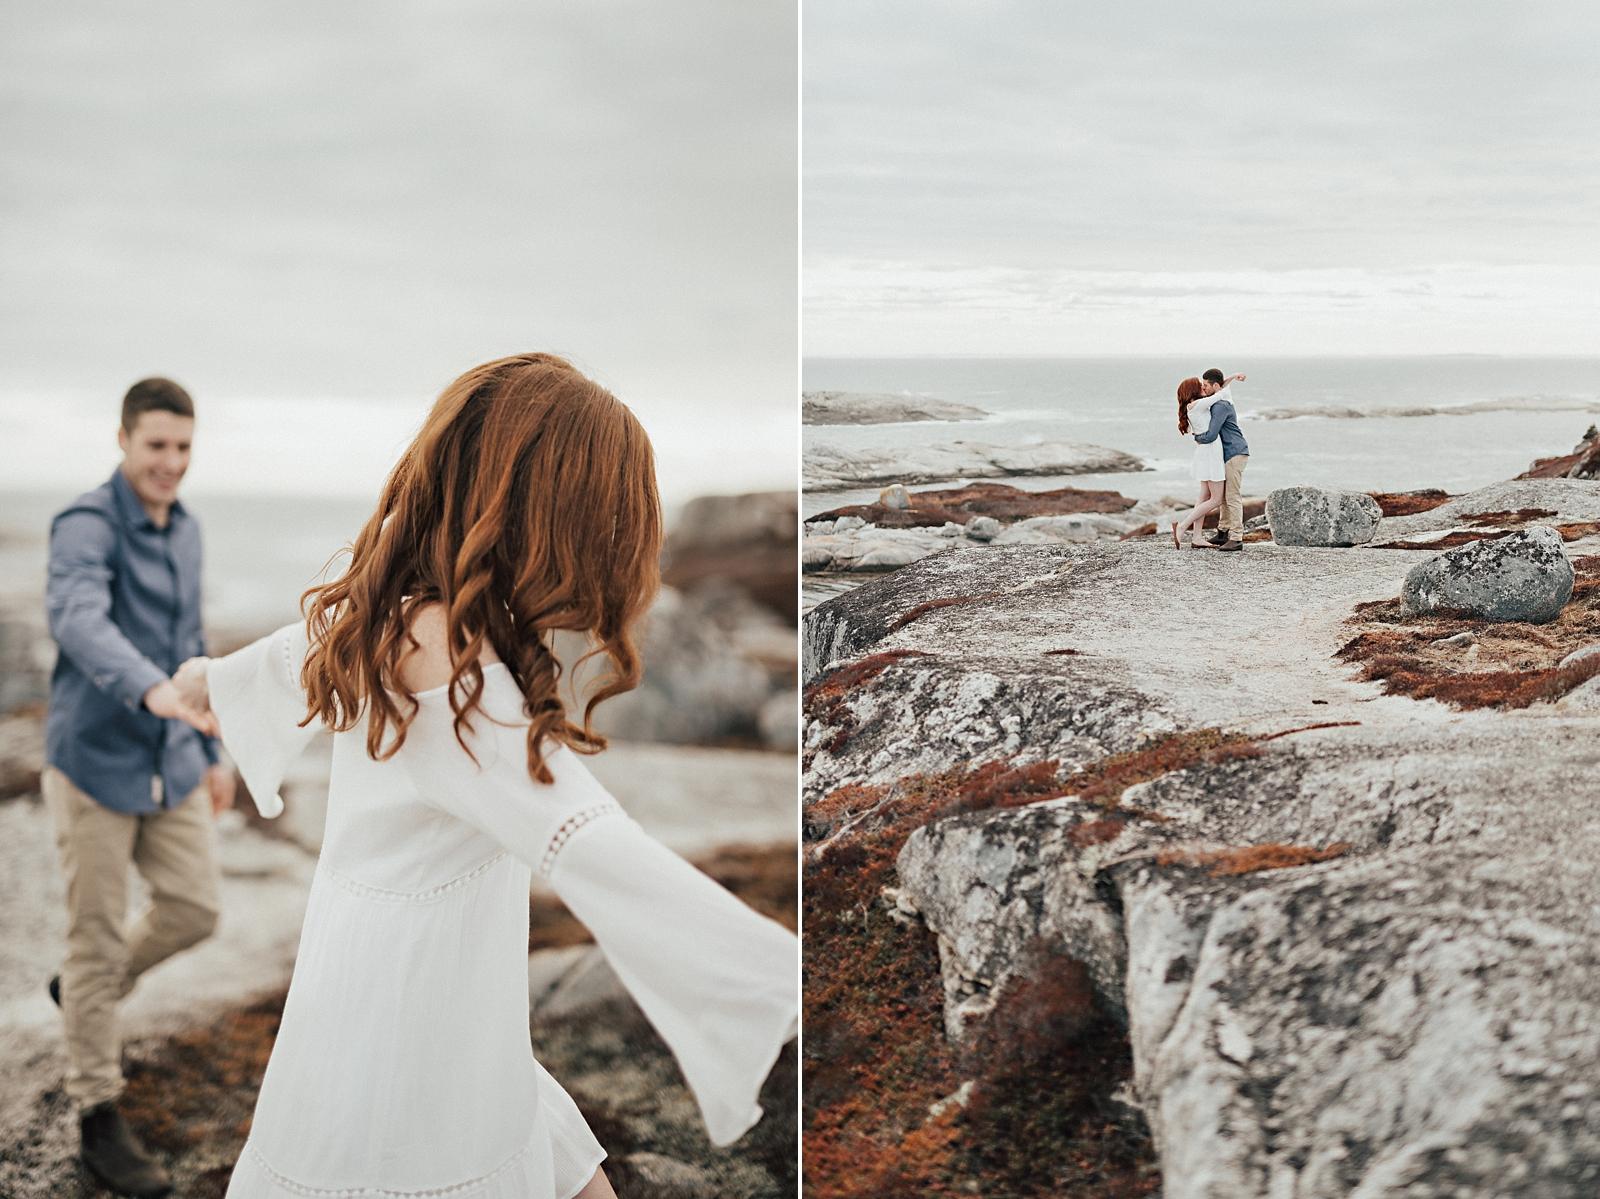 Halifax-Wedding-Photographer_Annie&Ryan_Ocean-Engagement-Shoot_16.jpg